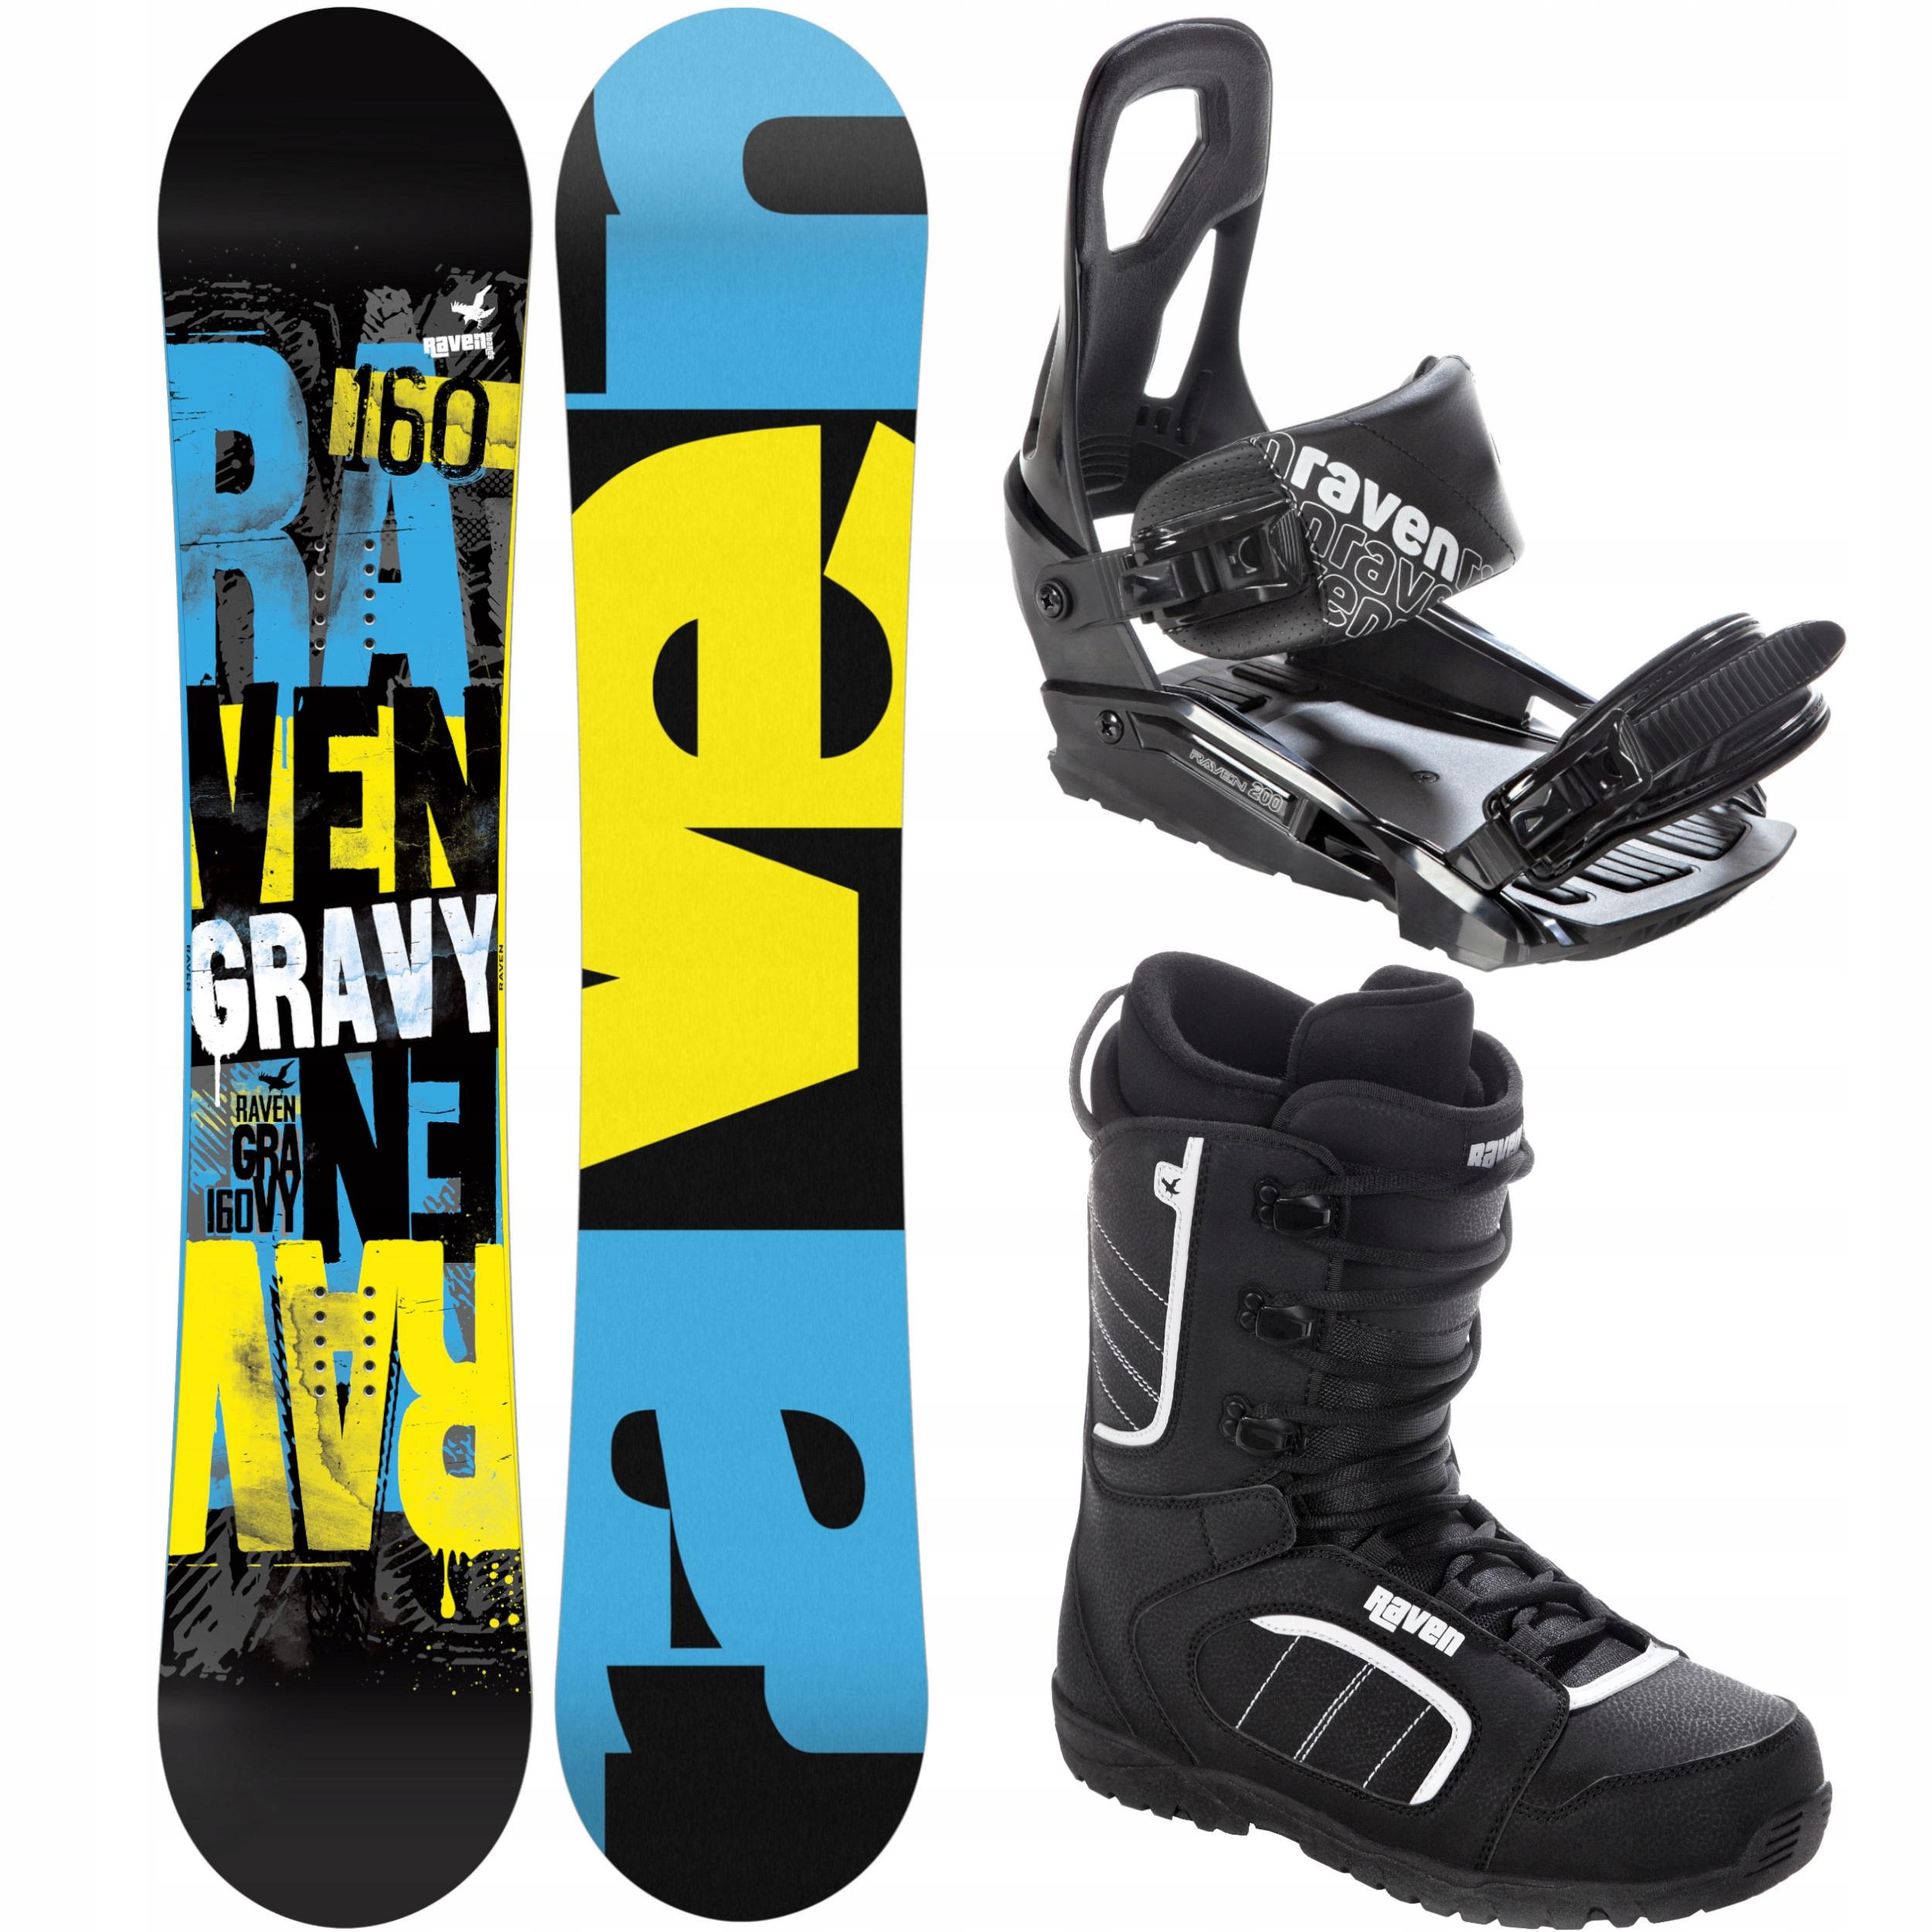 Комплект для сноуборда RAVEN Gravy 157cm 2021